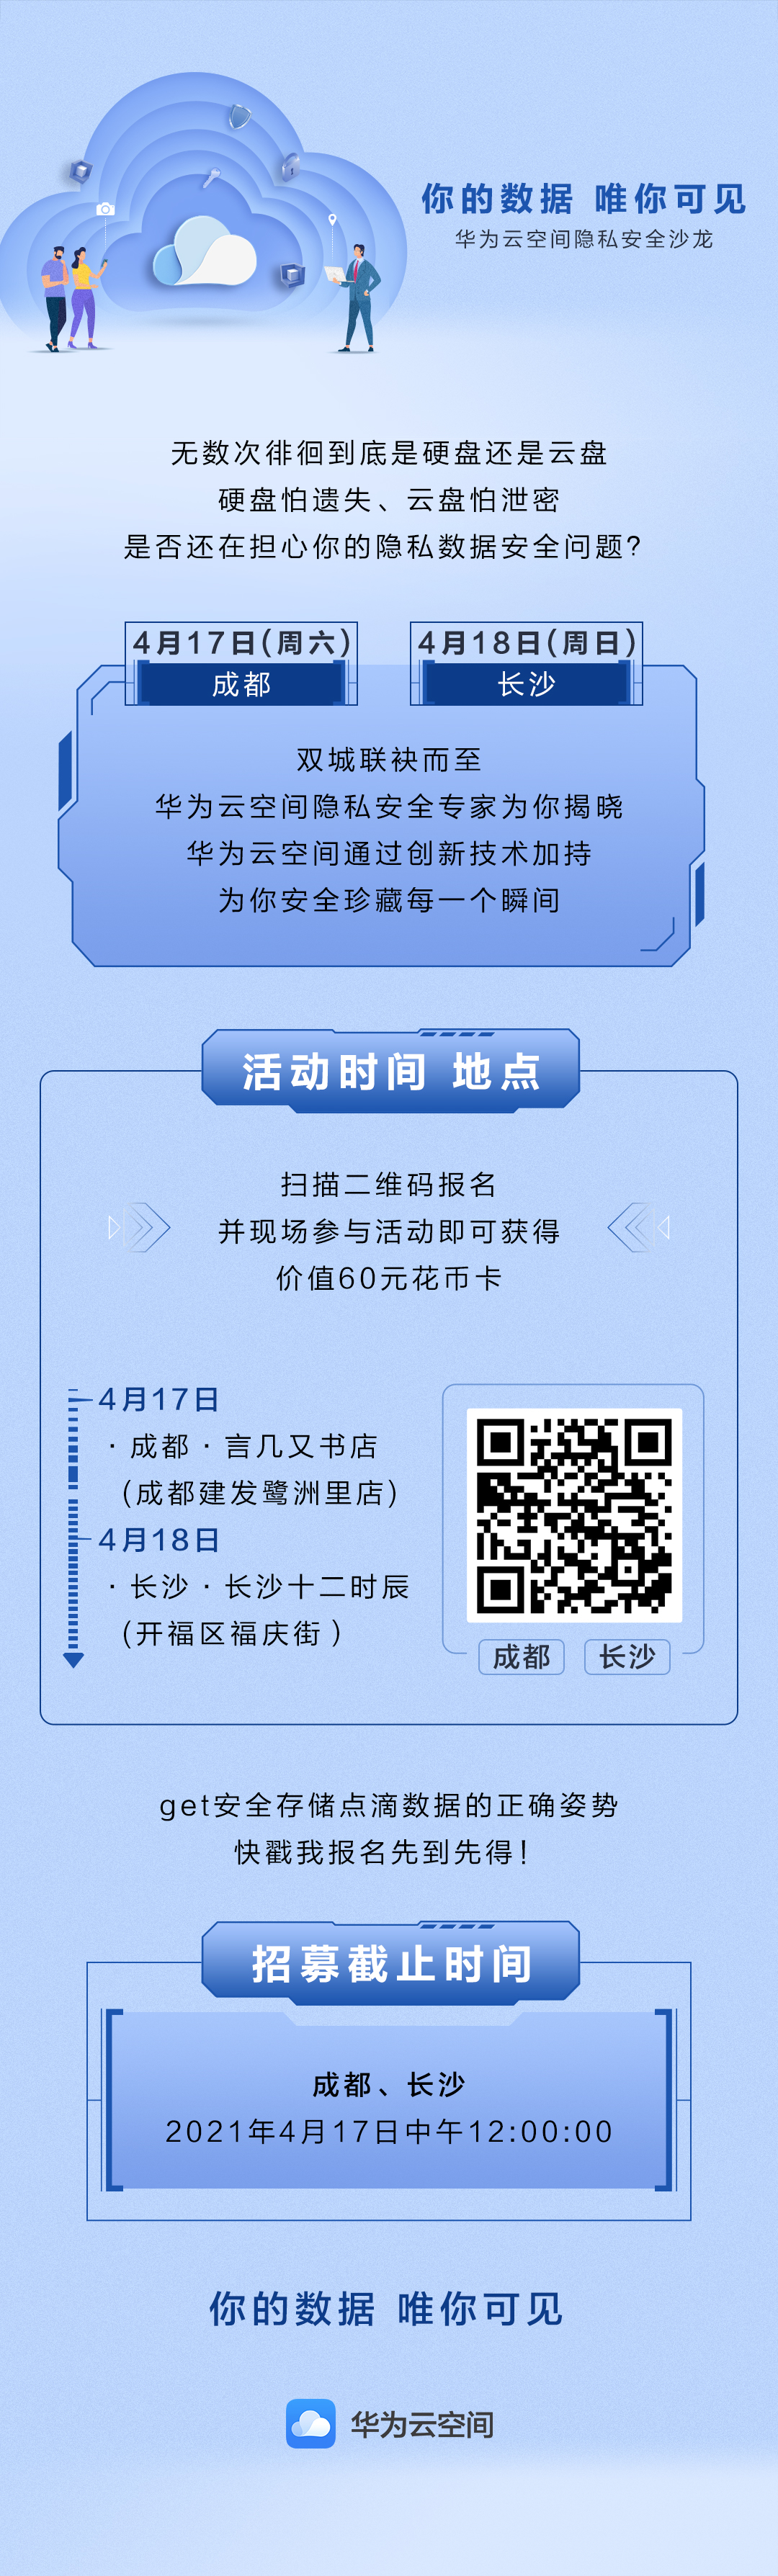 20210413-104729(eSpace).jpg